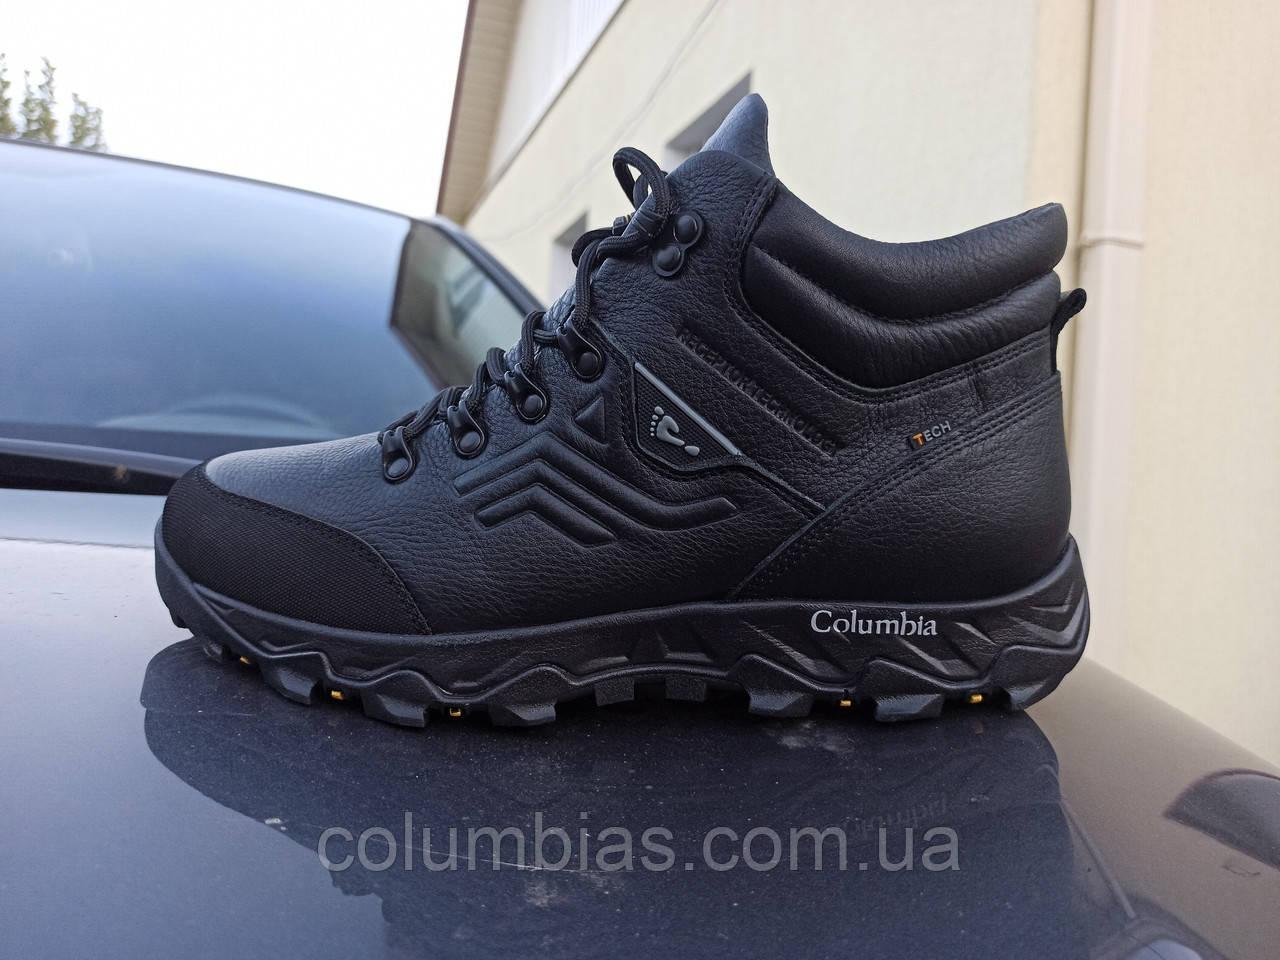 Зимние мужские термо ботинки Columbia gortex 897 TPGD